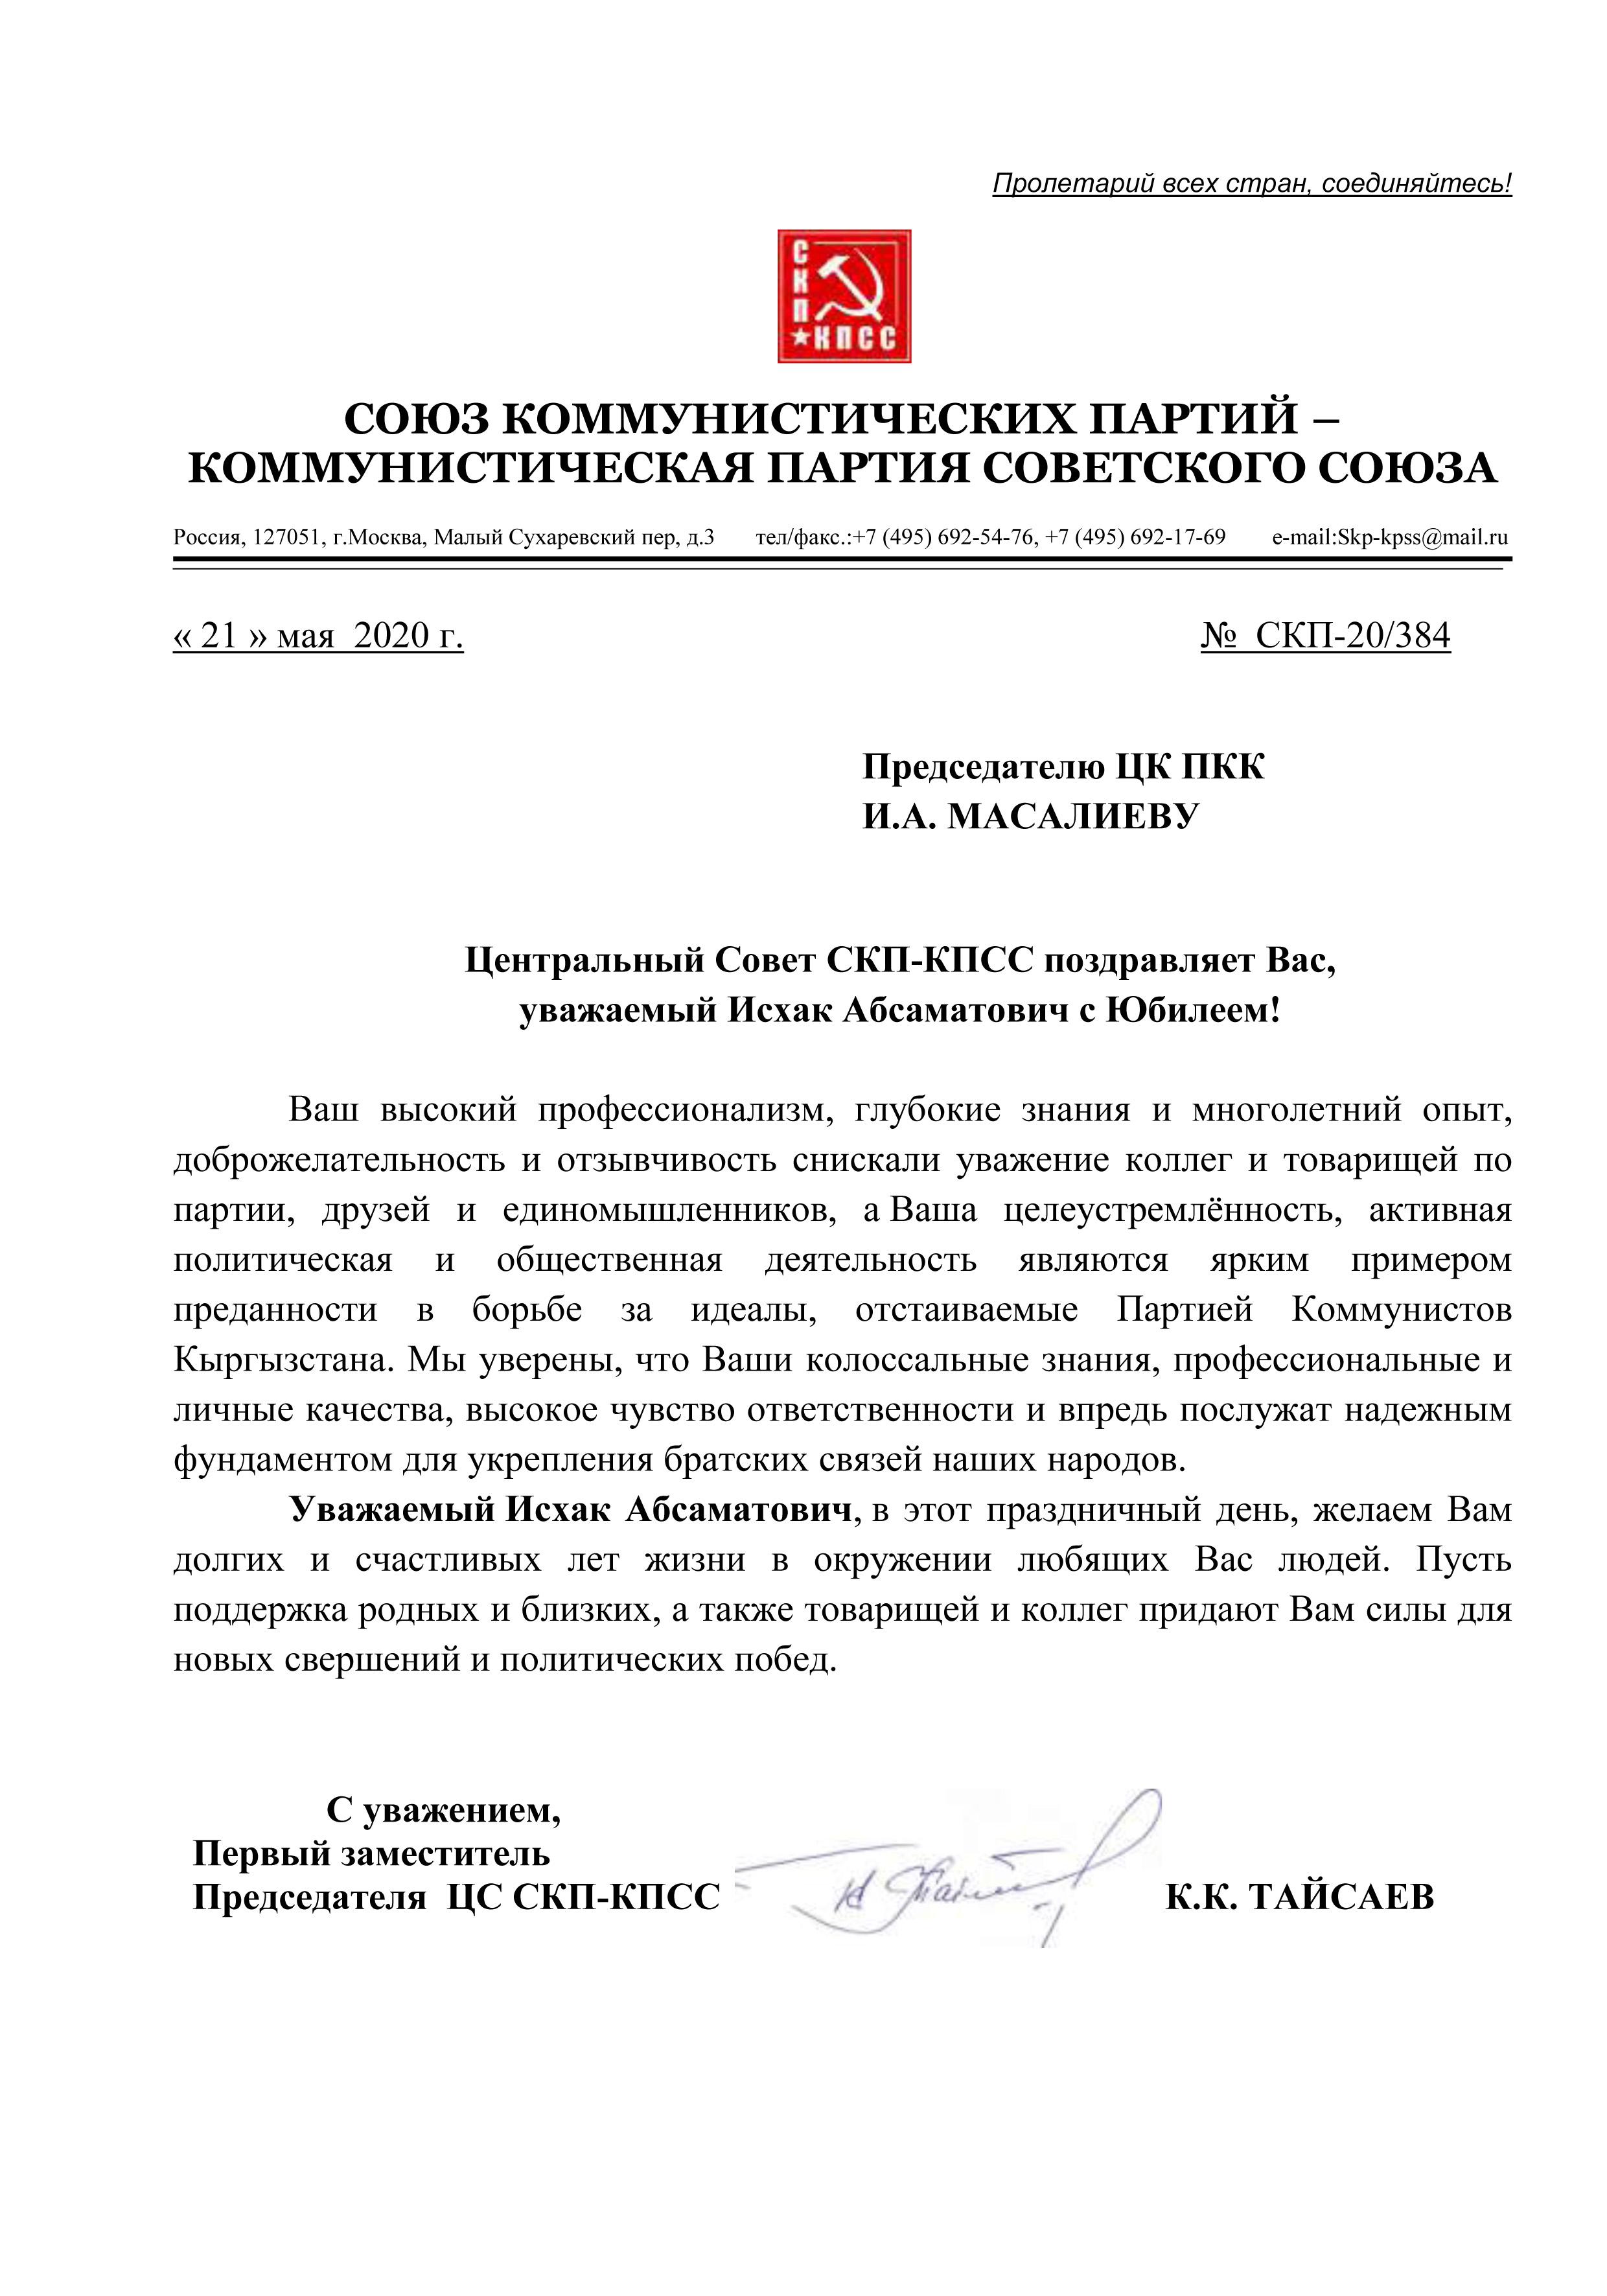 И.А. МАСАЛИЕВУ ДР СКП-20